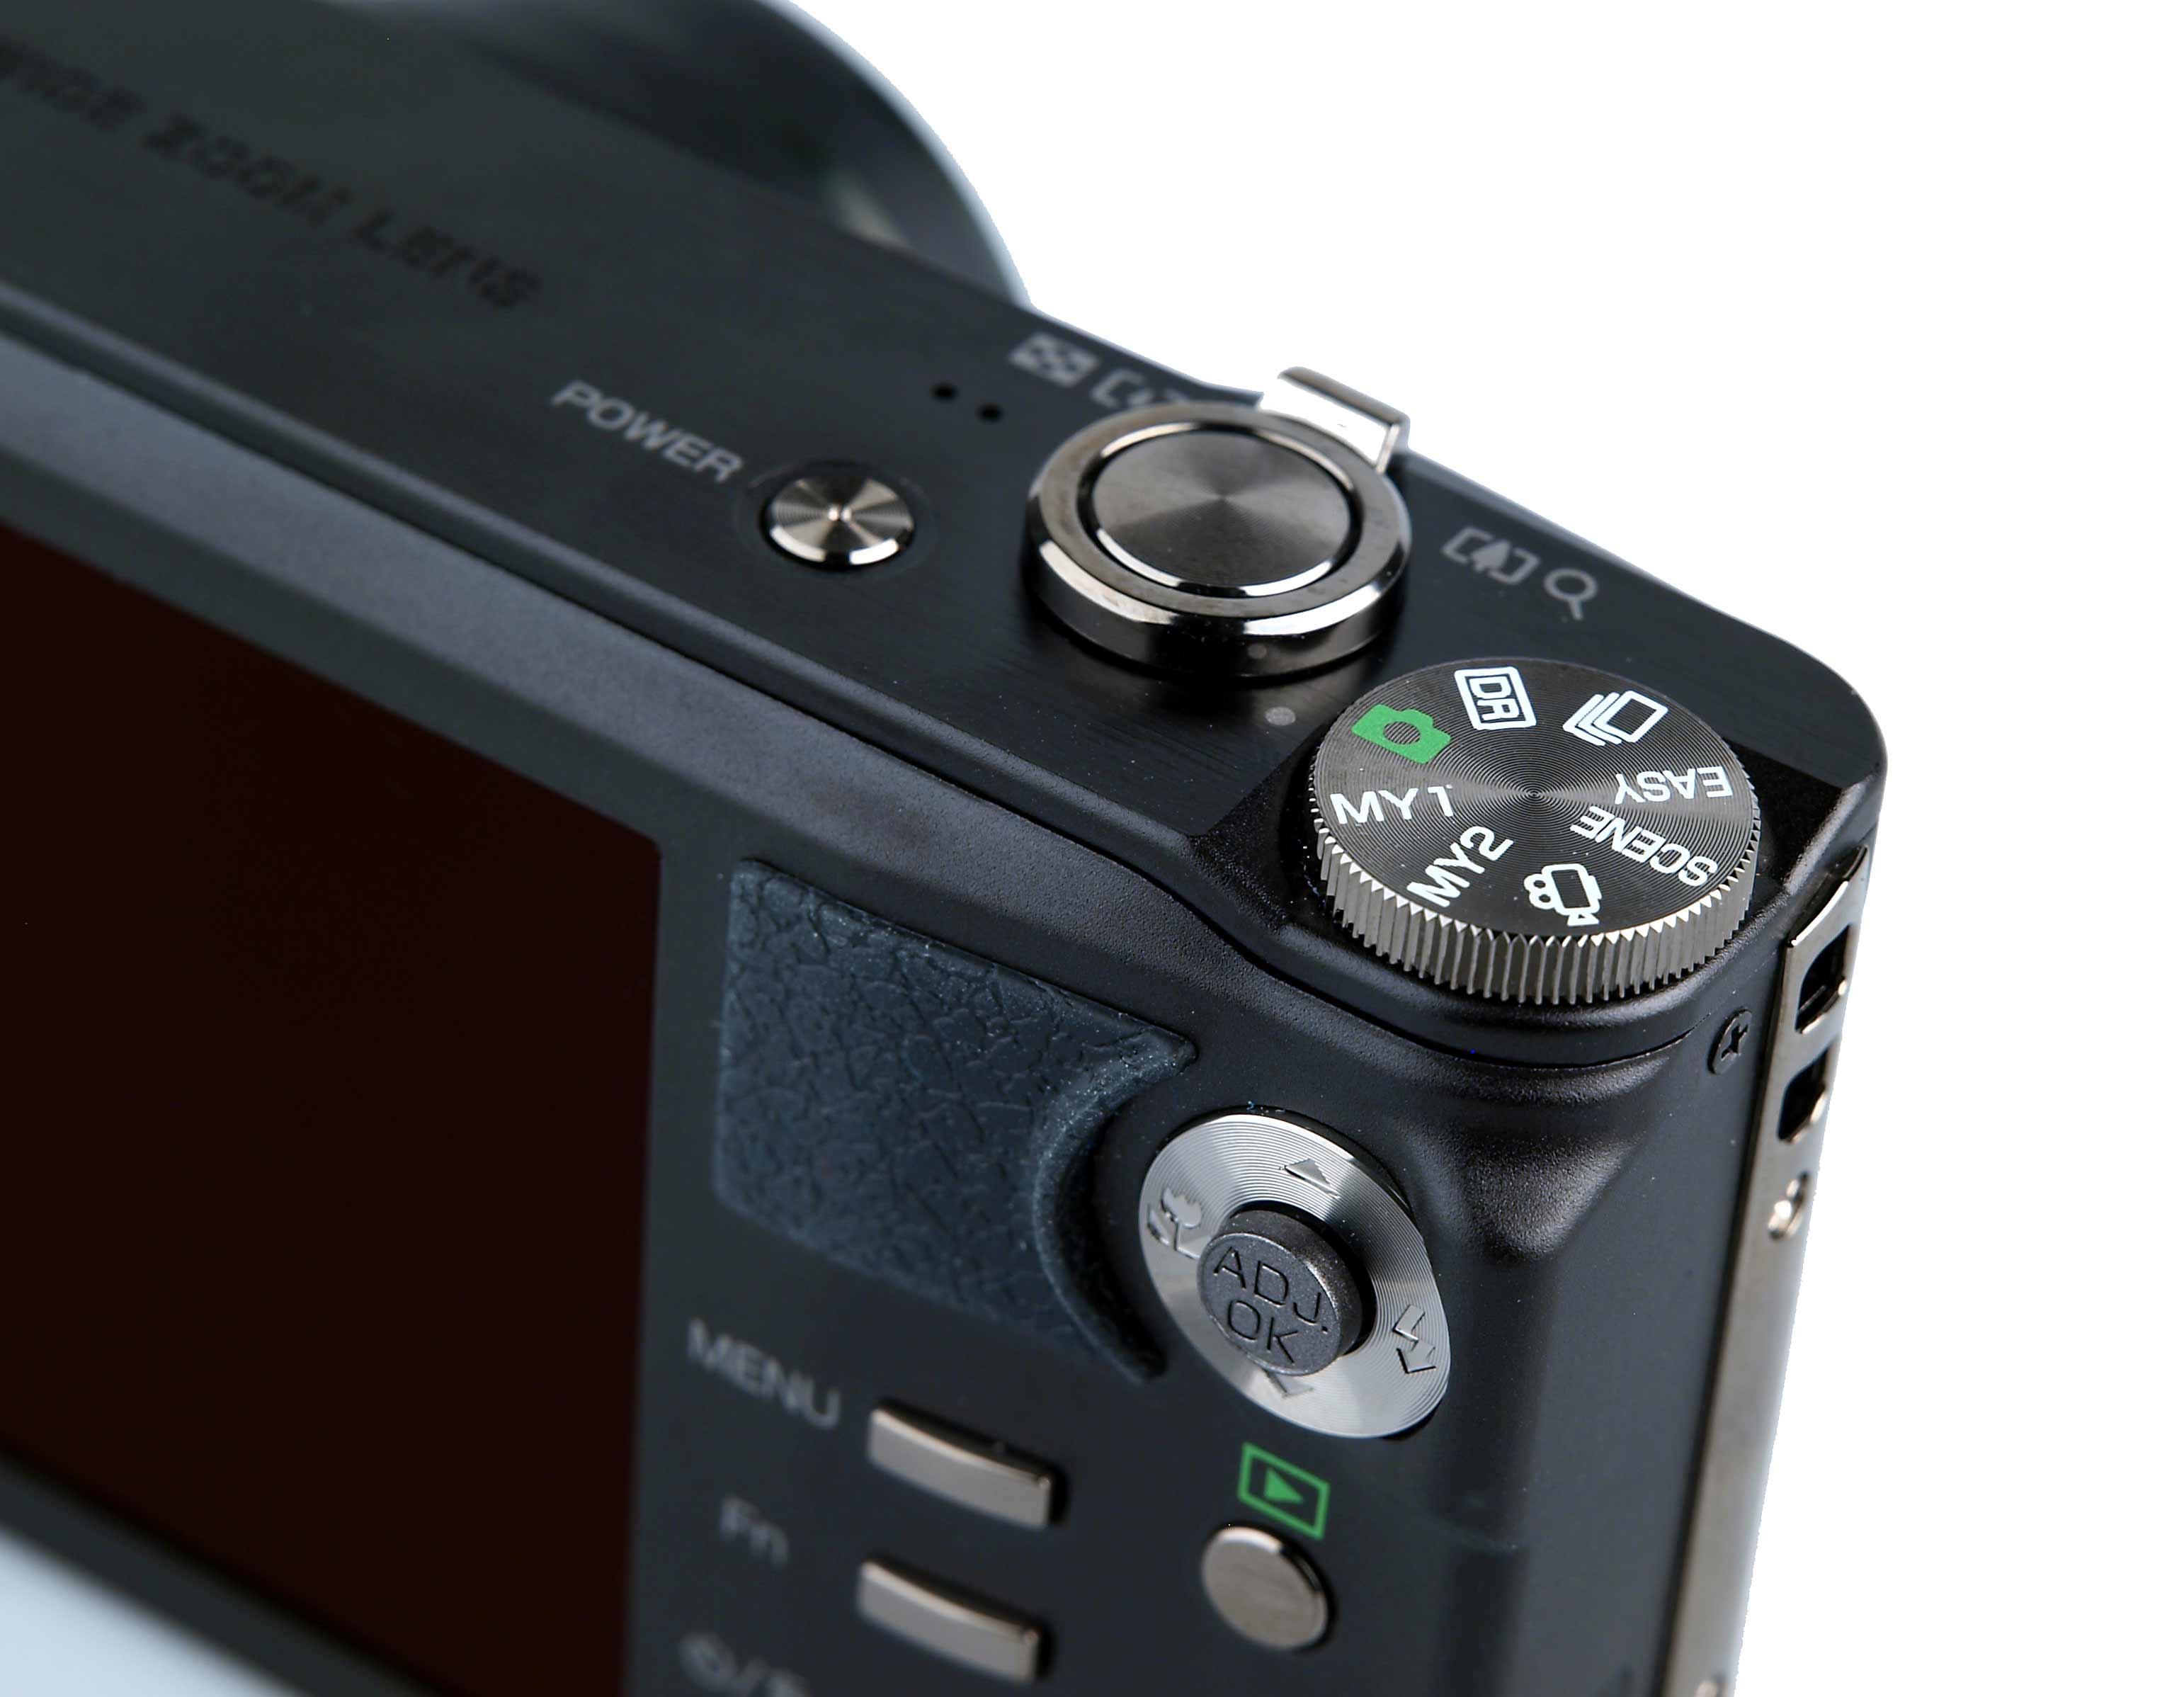 Ricoh CX1 Digital Camera Drivers PC